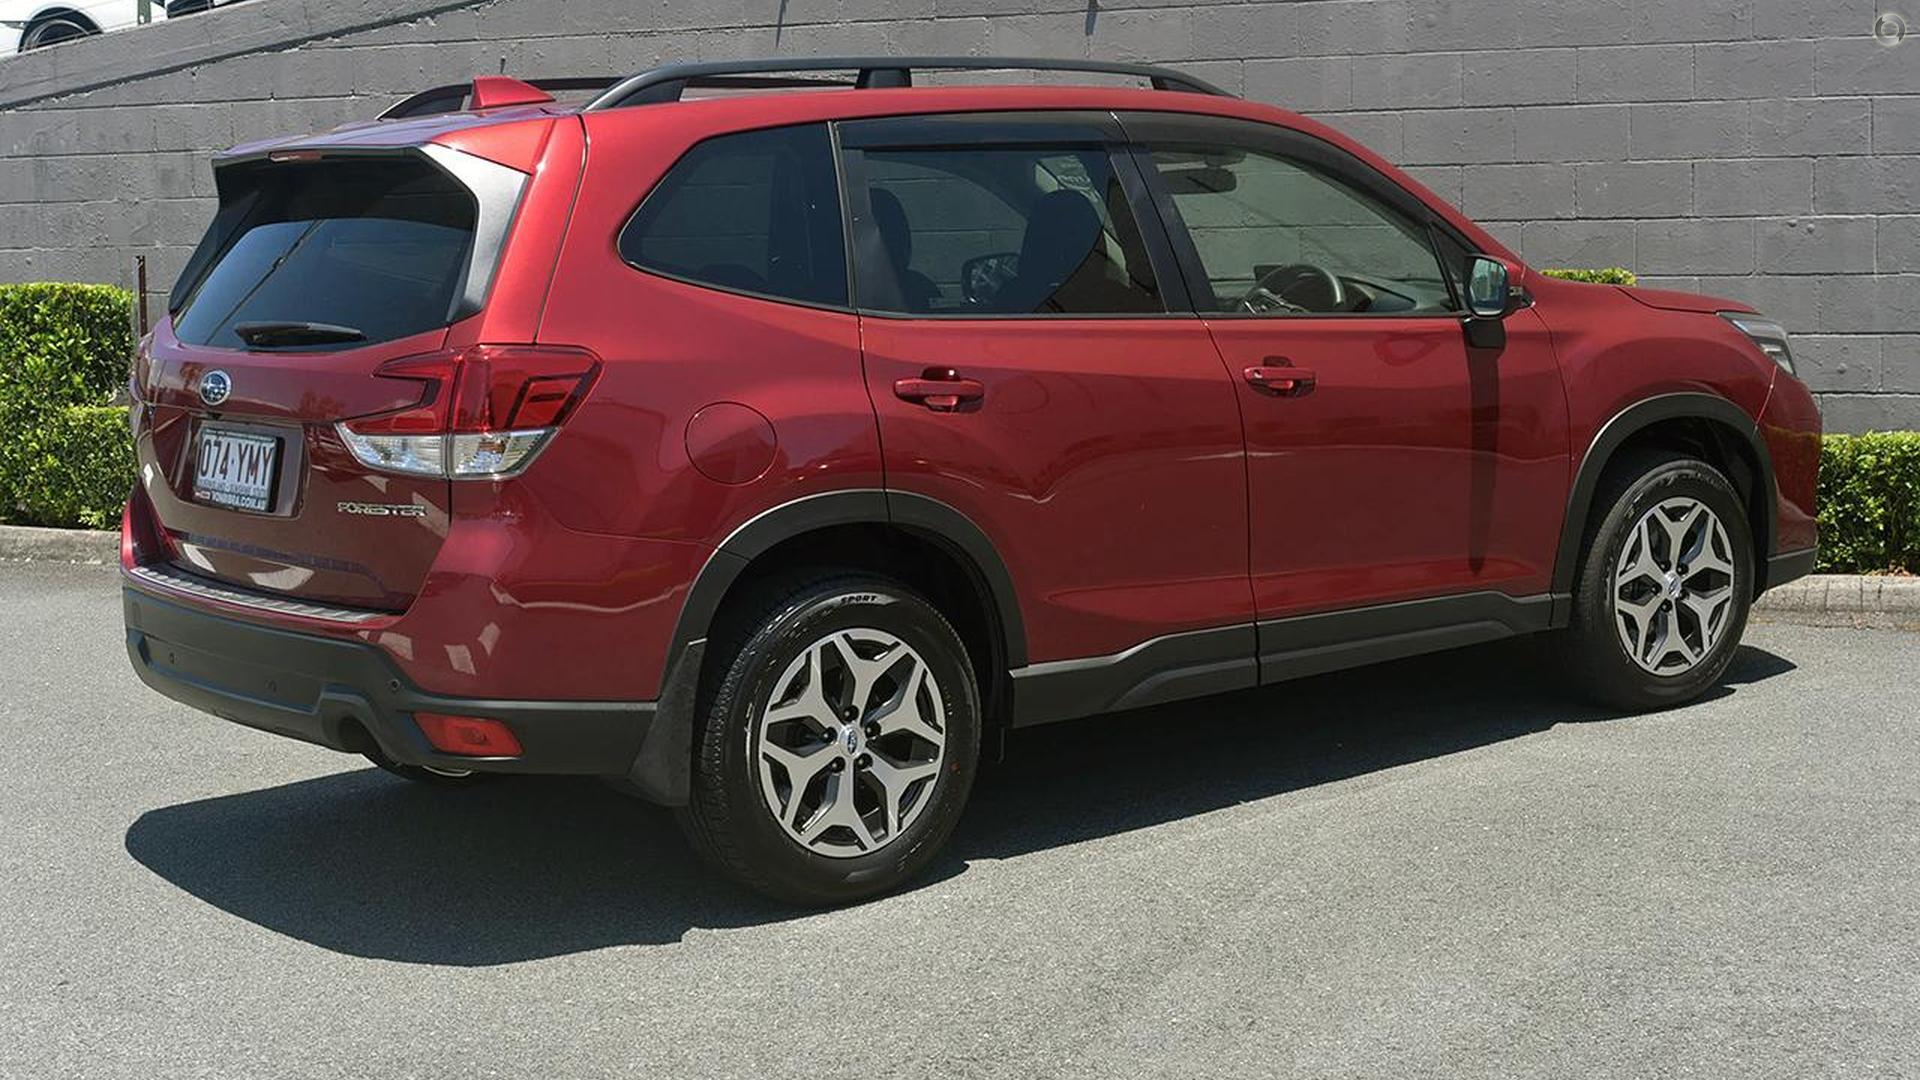 2018 Subaru Forester 2.5i-L S5